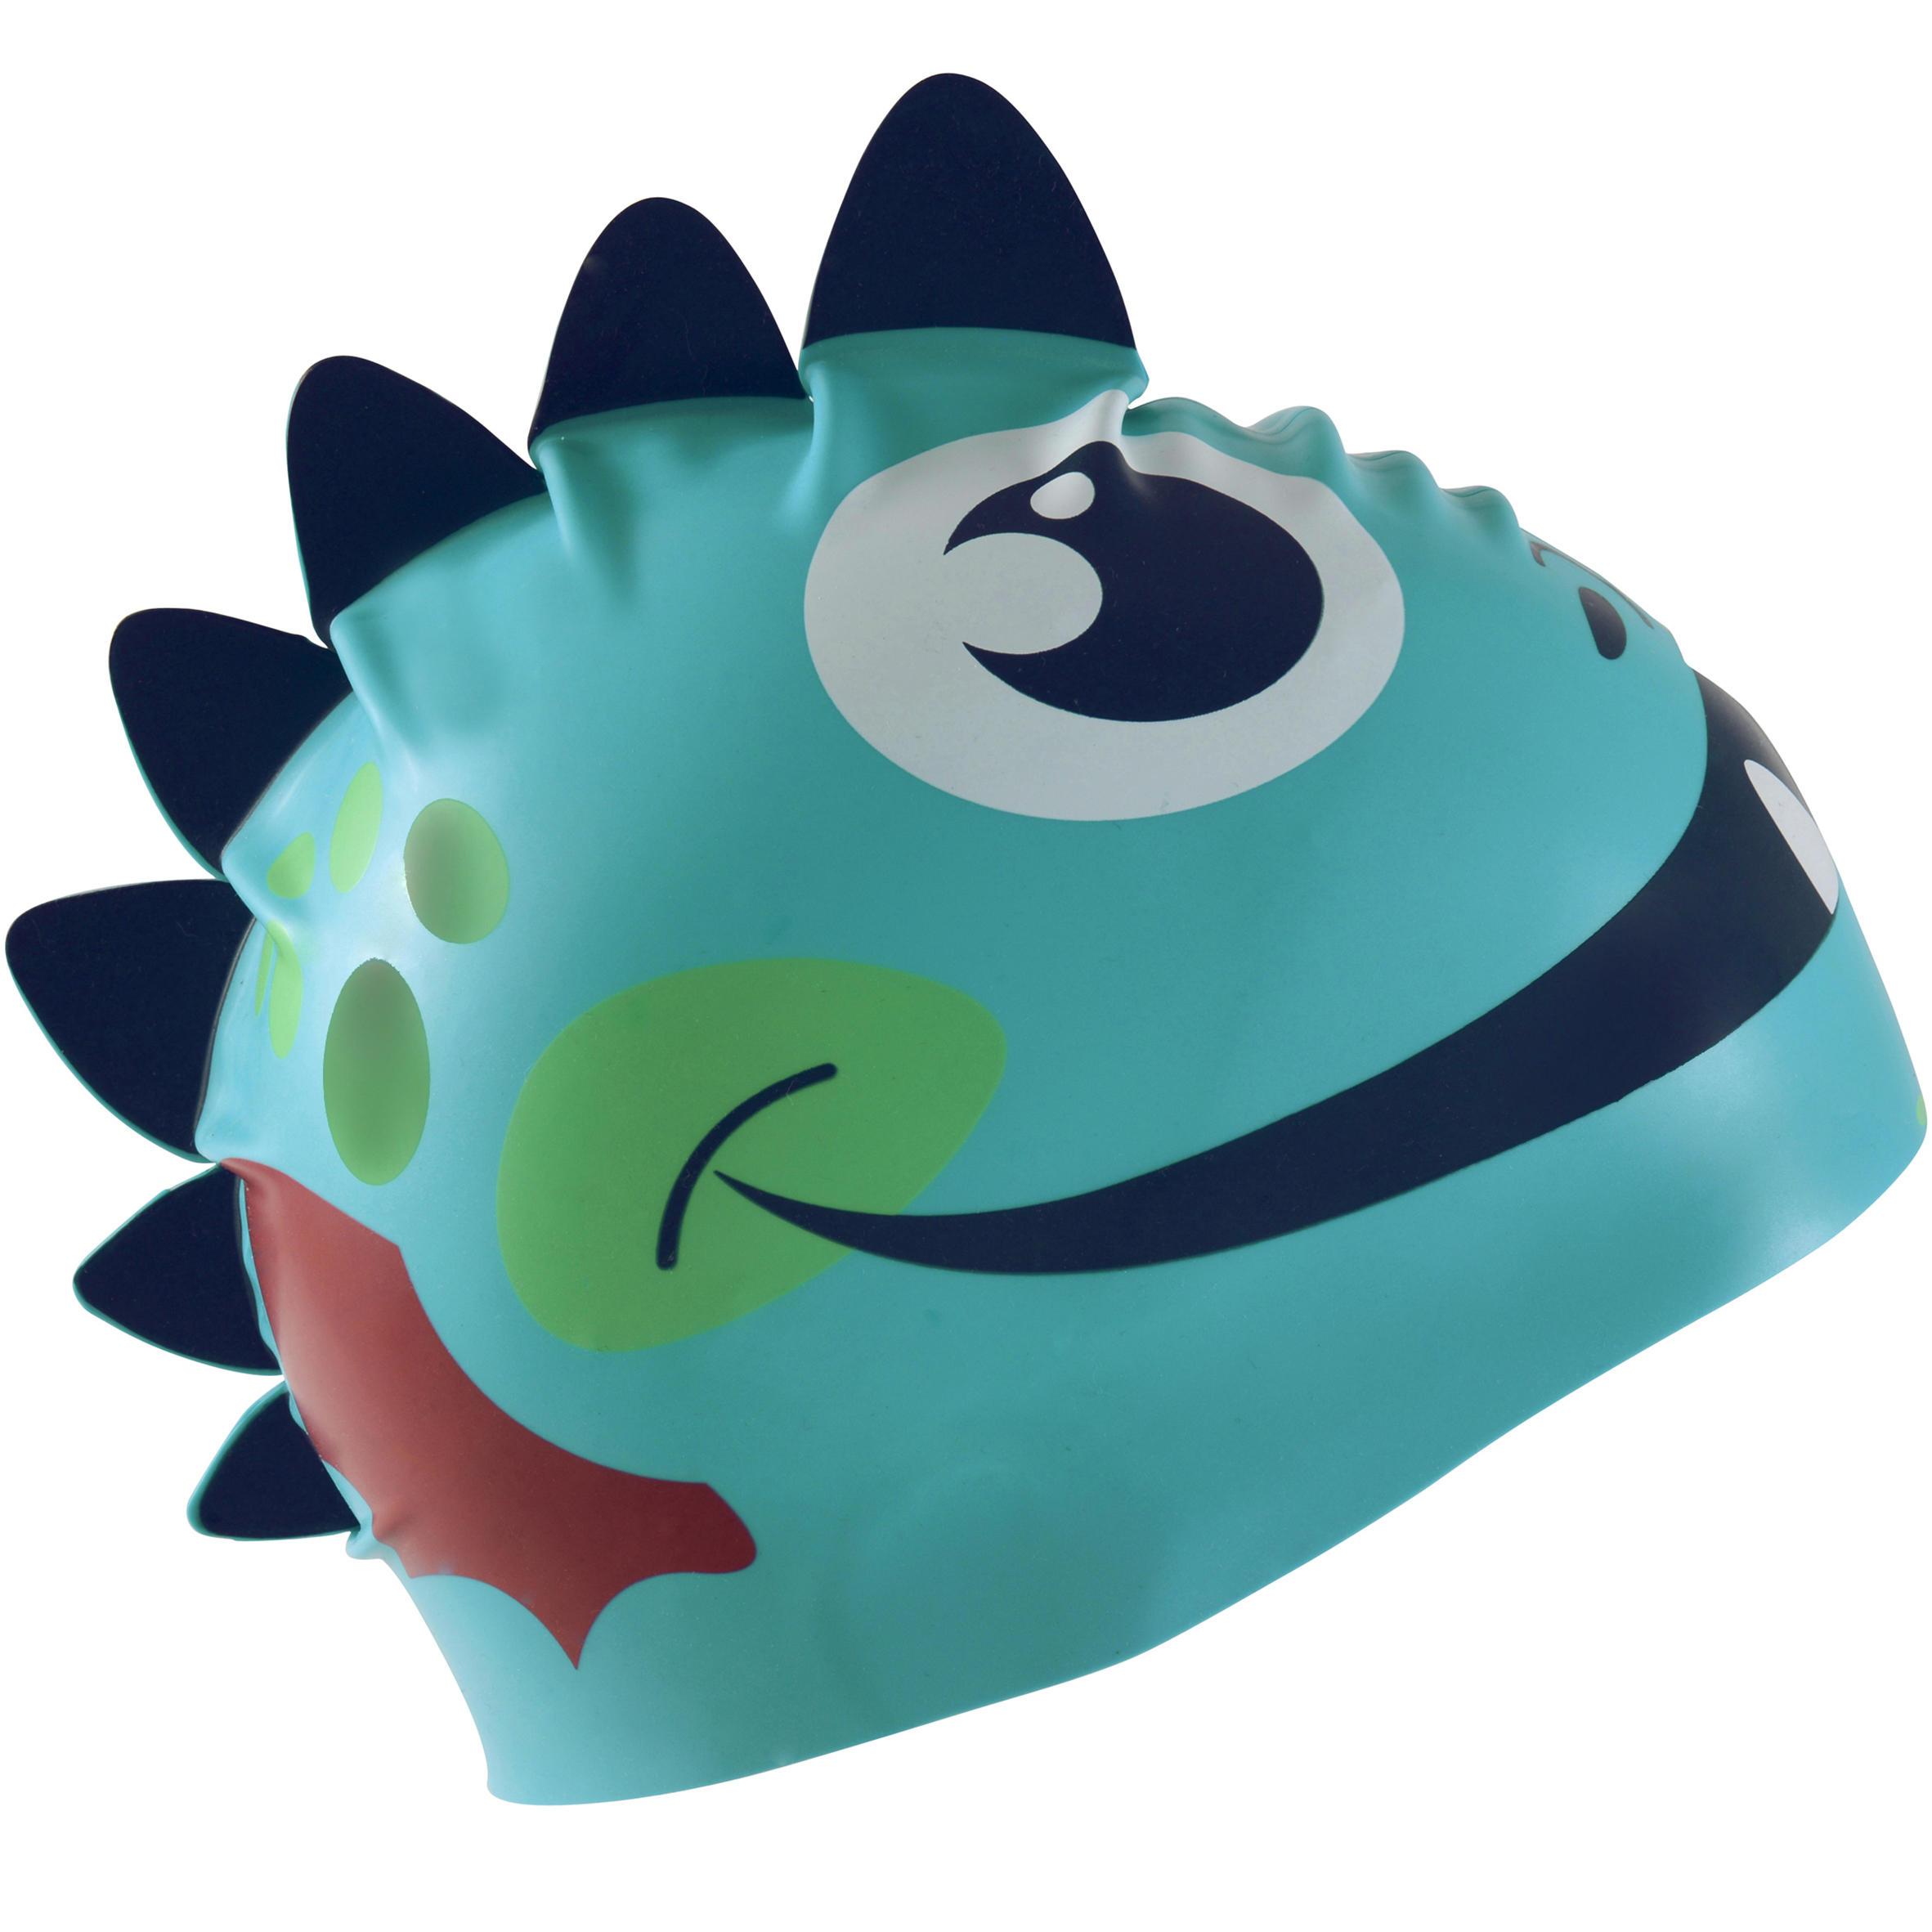 SILICONE SWIM CAP - DRAGON BLUE